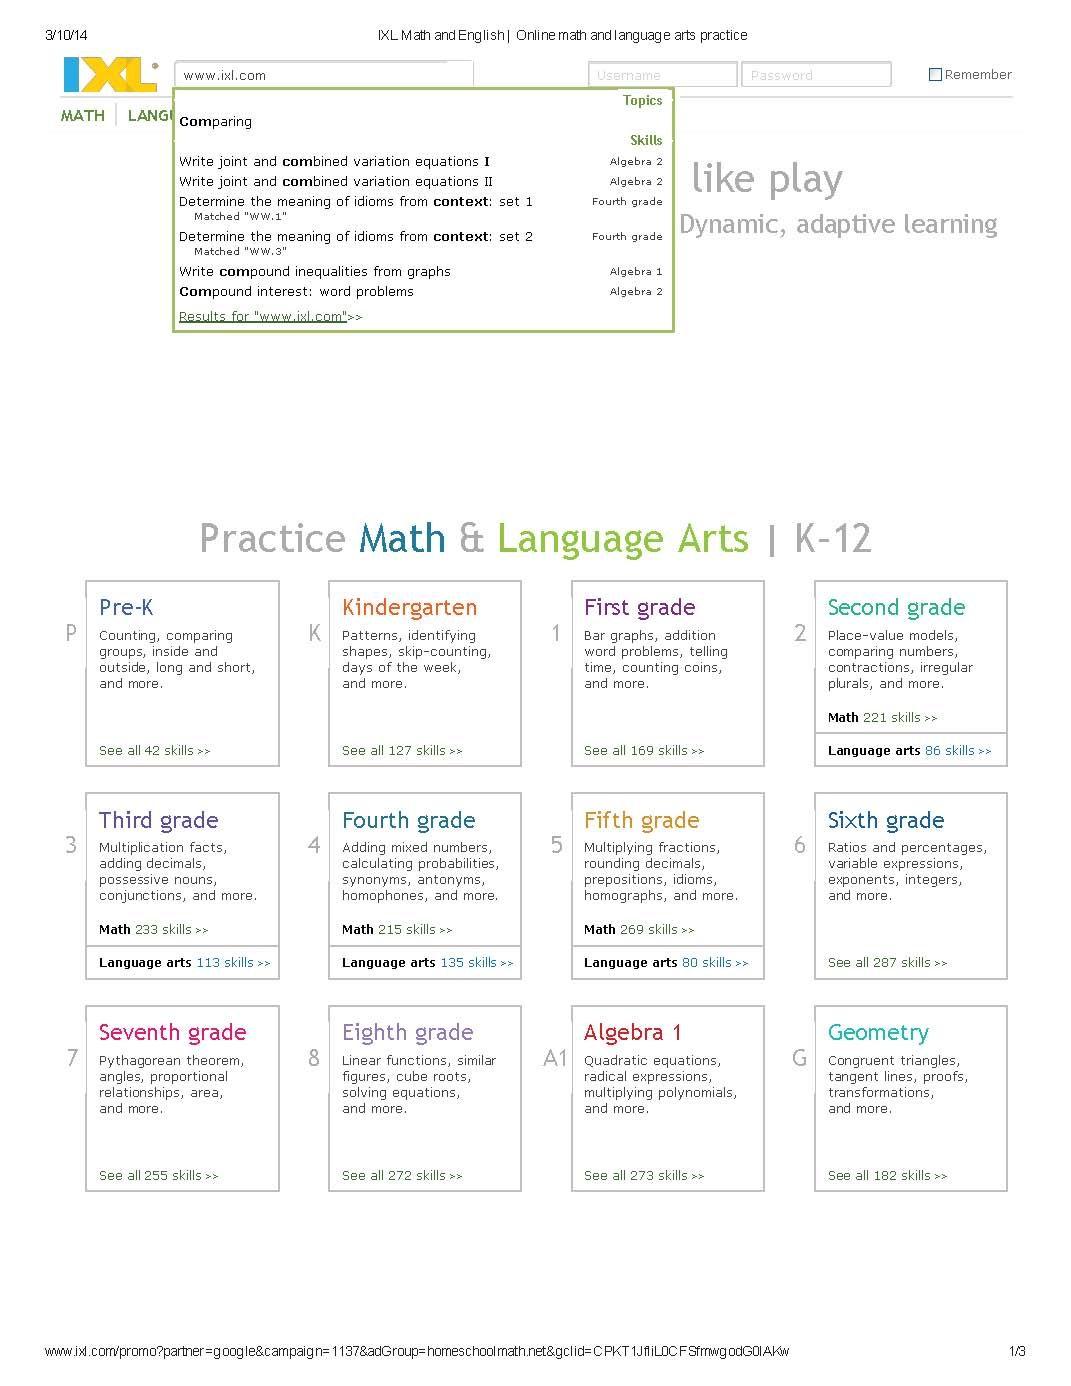 ixl worksheets homeschool homeschool bullet journal worksheets. Black Bedroom Furniture Sets. Home Design Ideas